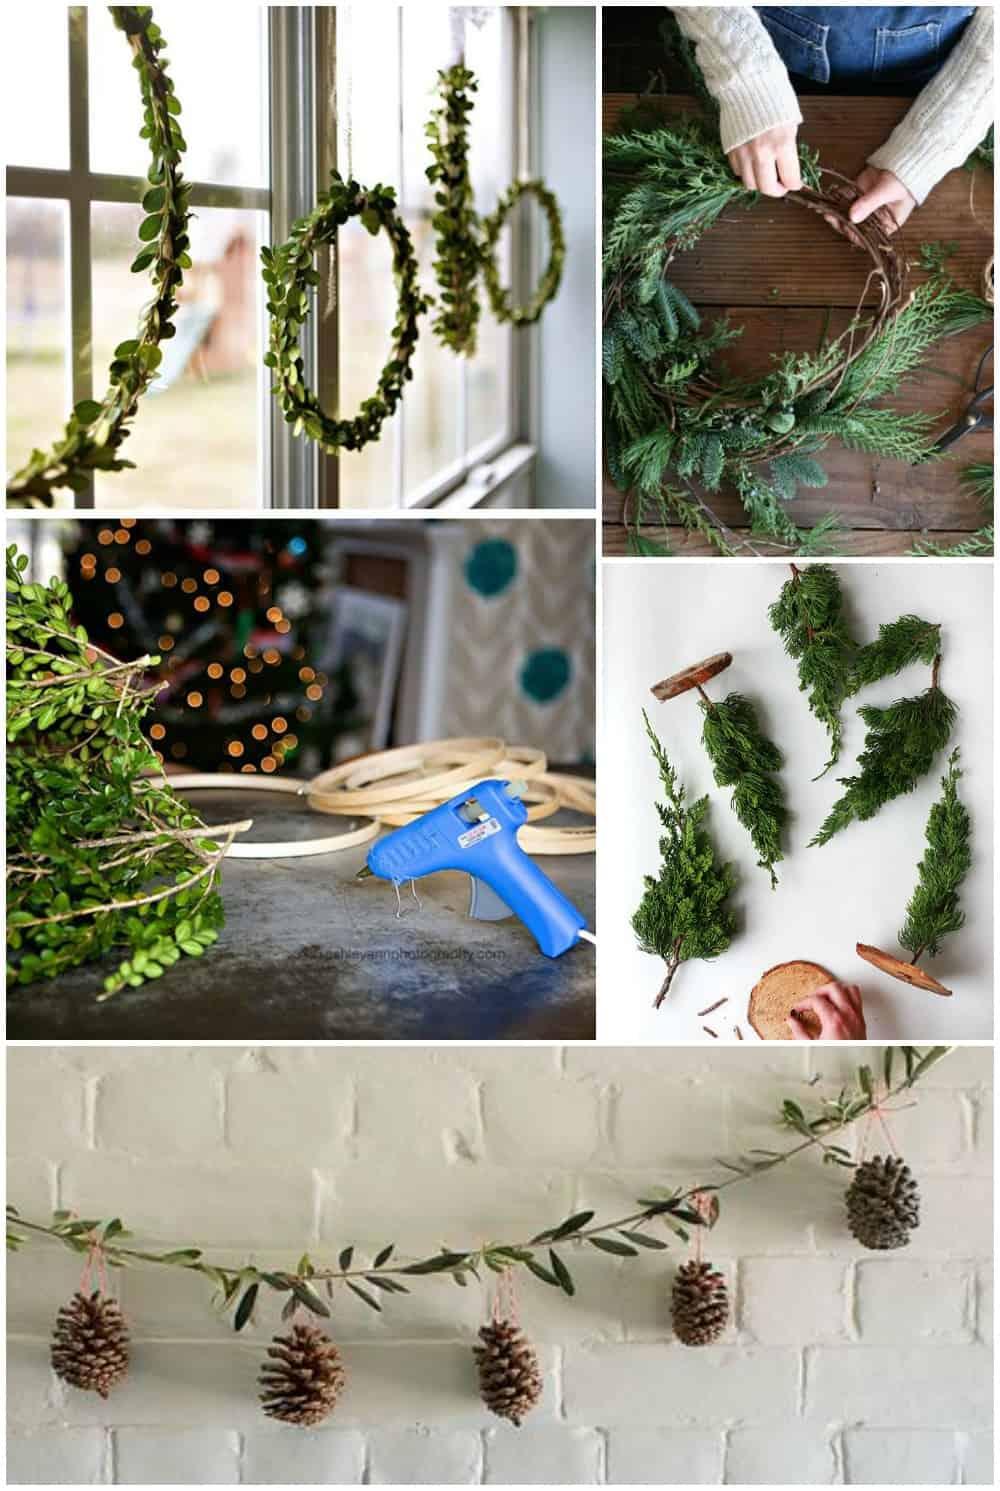 Natale arredo tendenze shabby chic stile scandinavo e for Arredi natalizi per esterni